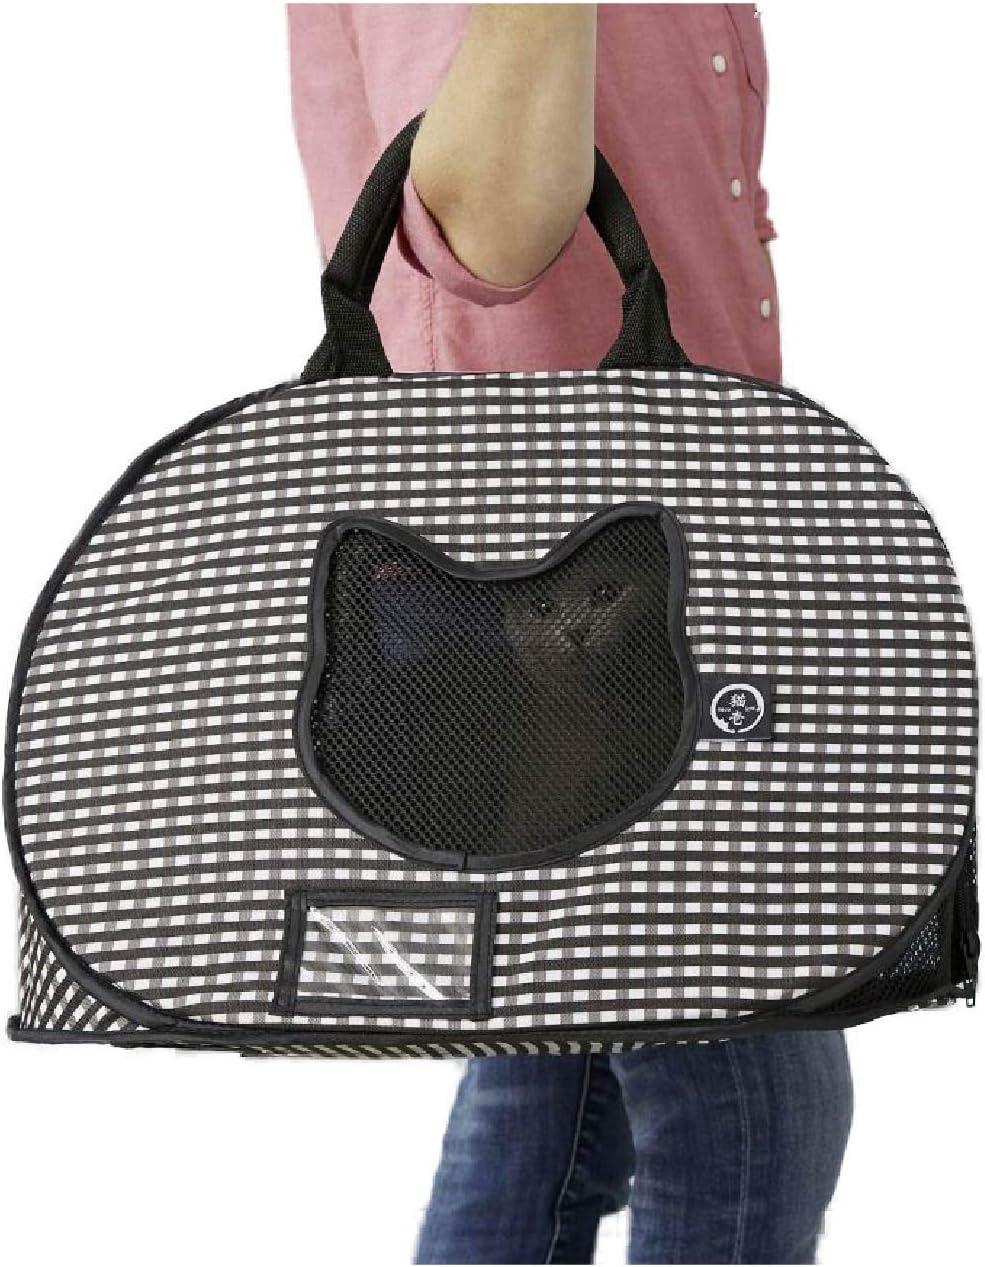 Necoichi Ultralite Pop-up Cat Carrier